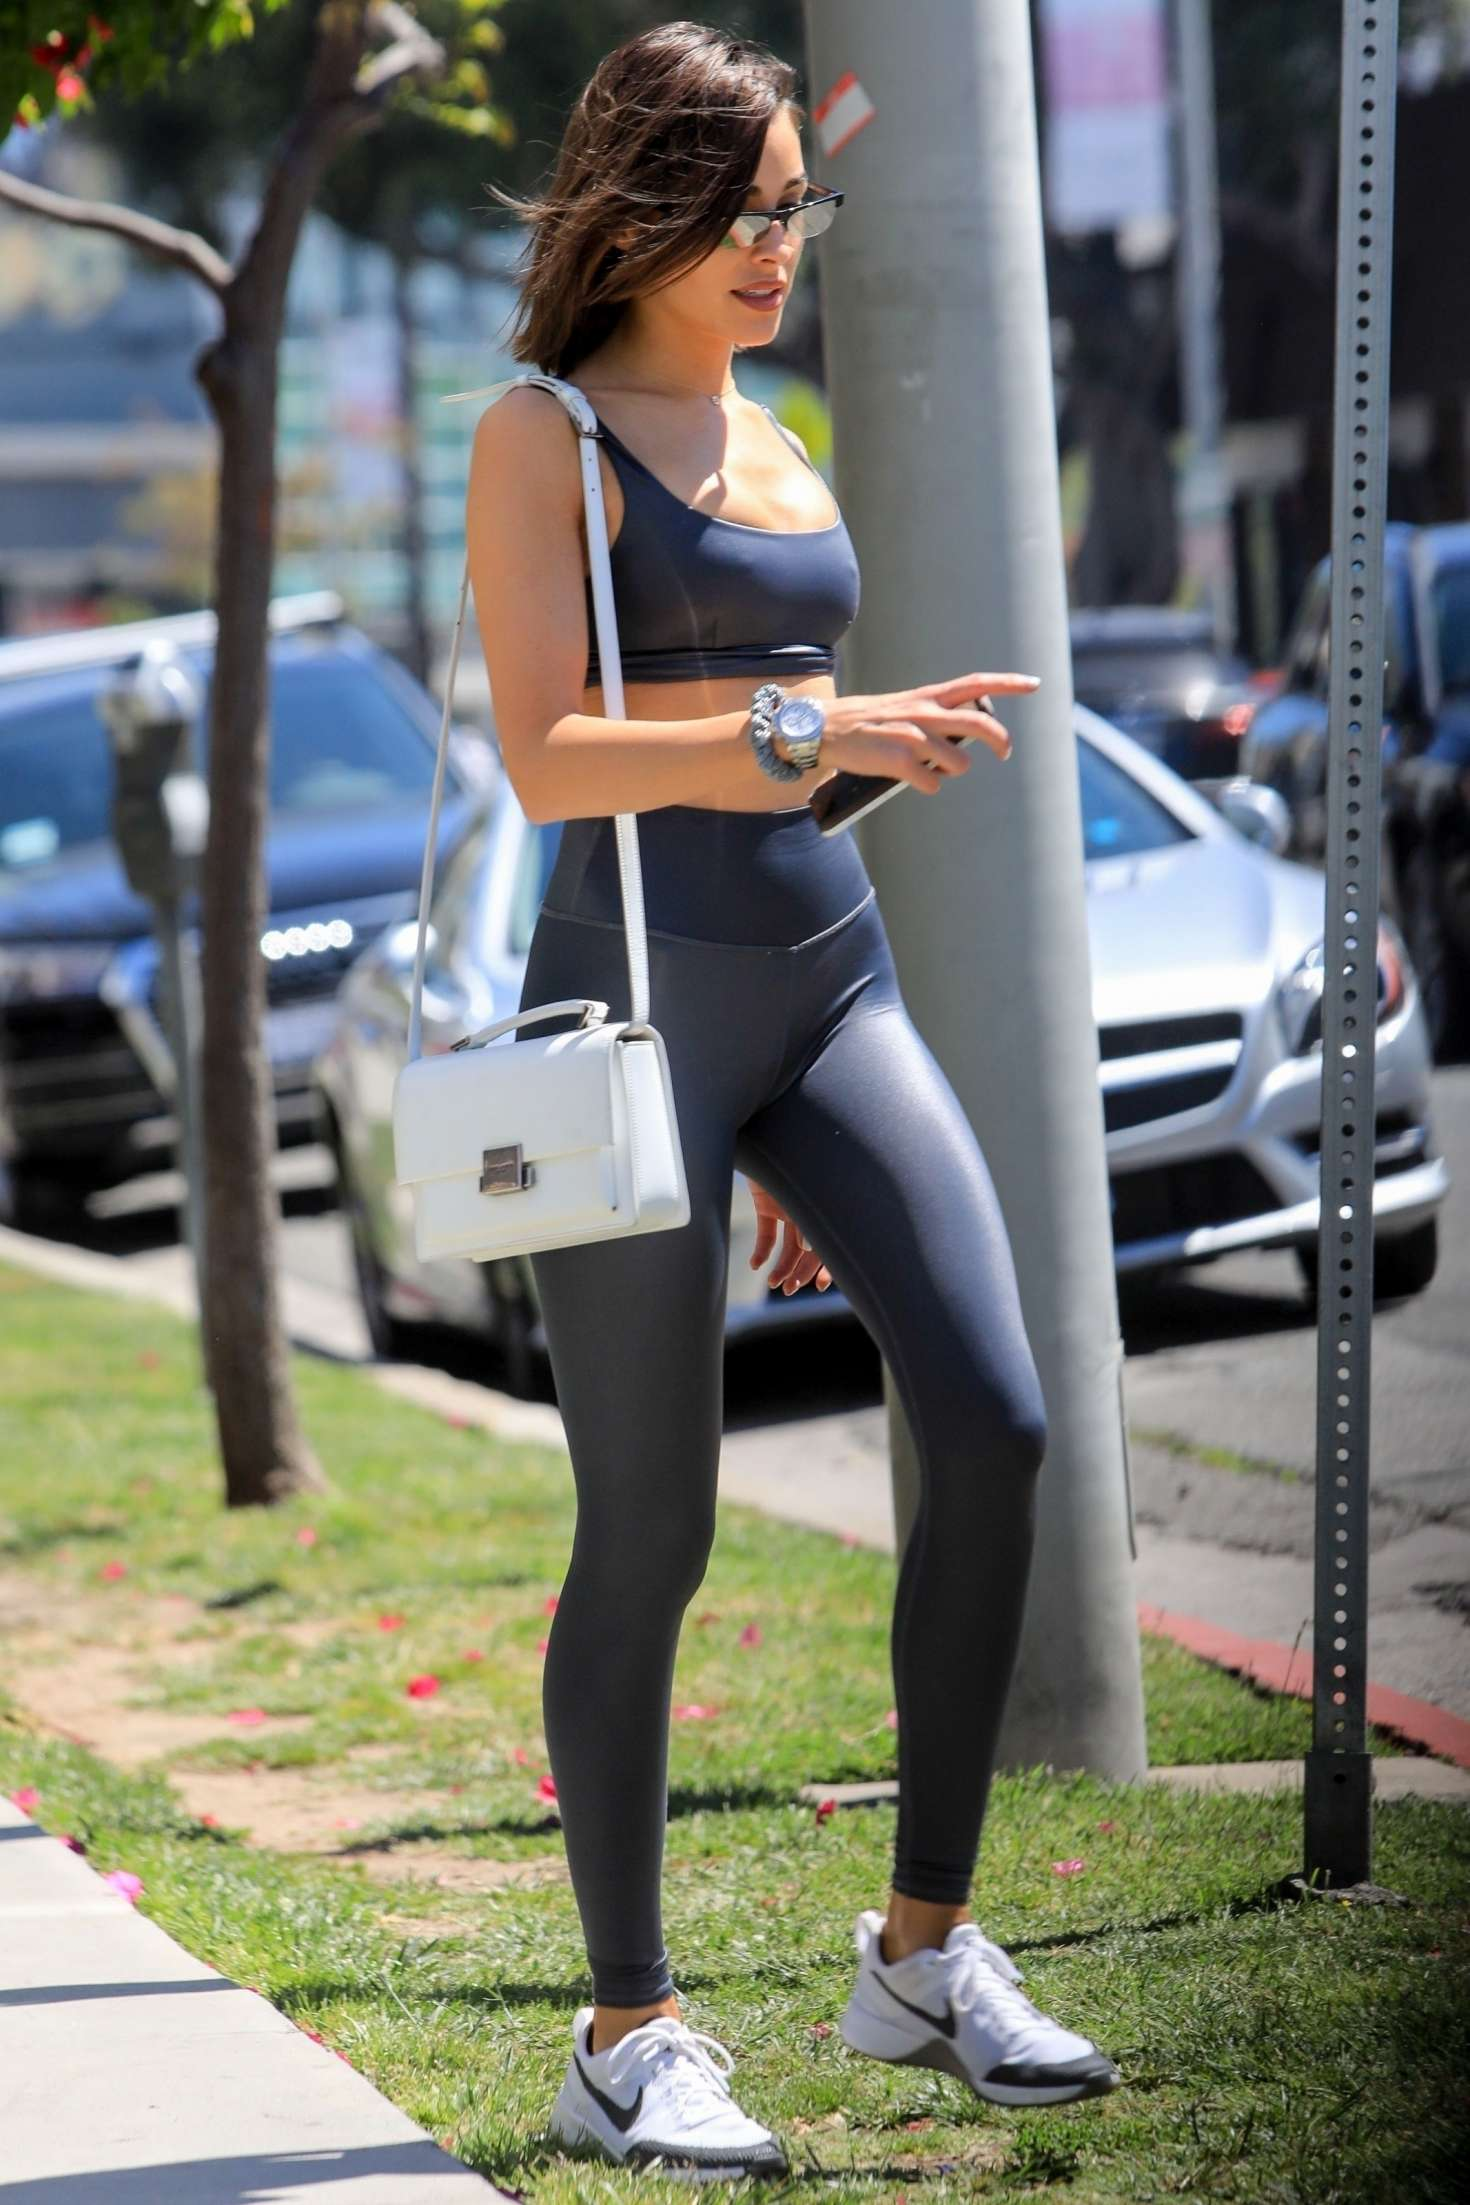 Olivia Culpo donning shiny black Alo skinny leggings with a spandex fabric